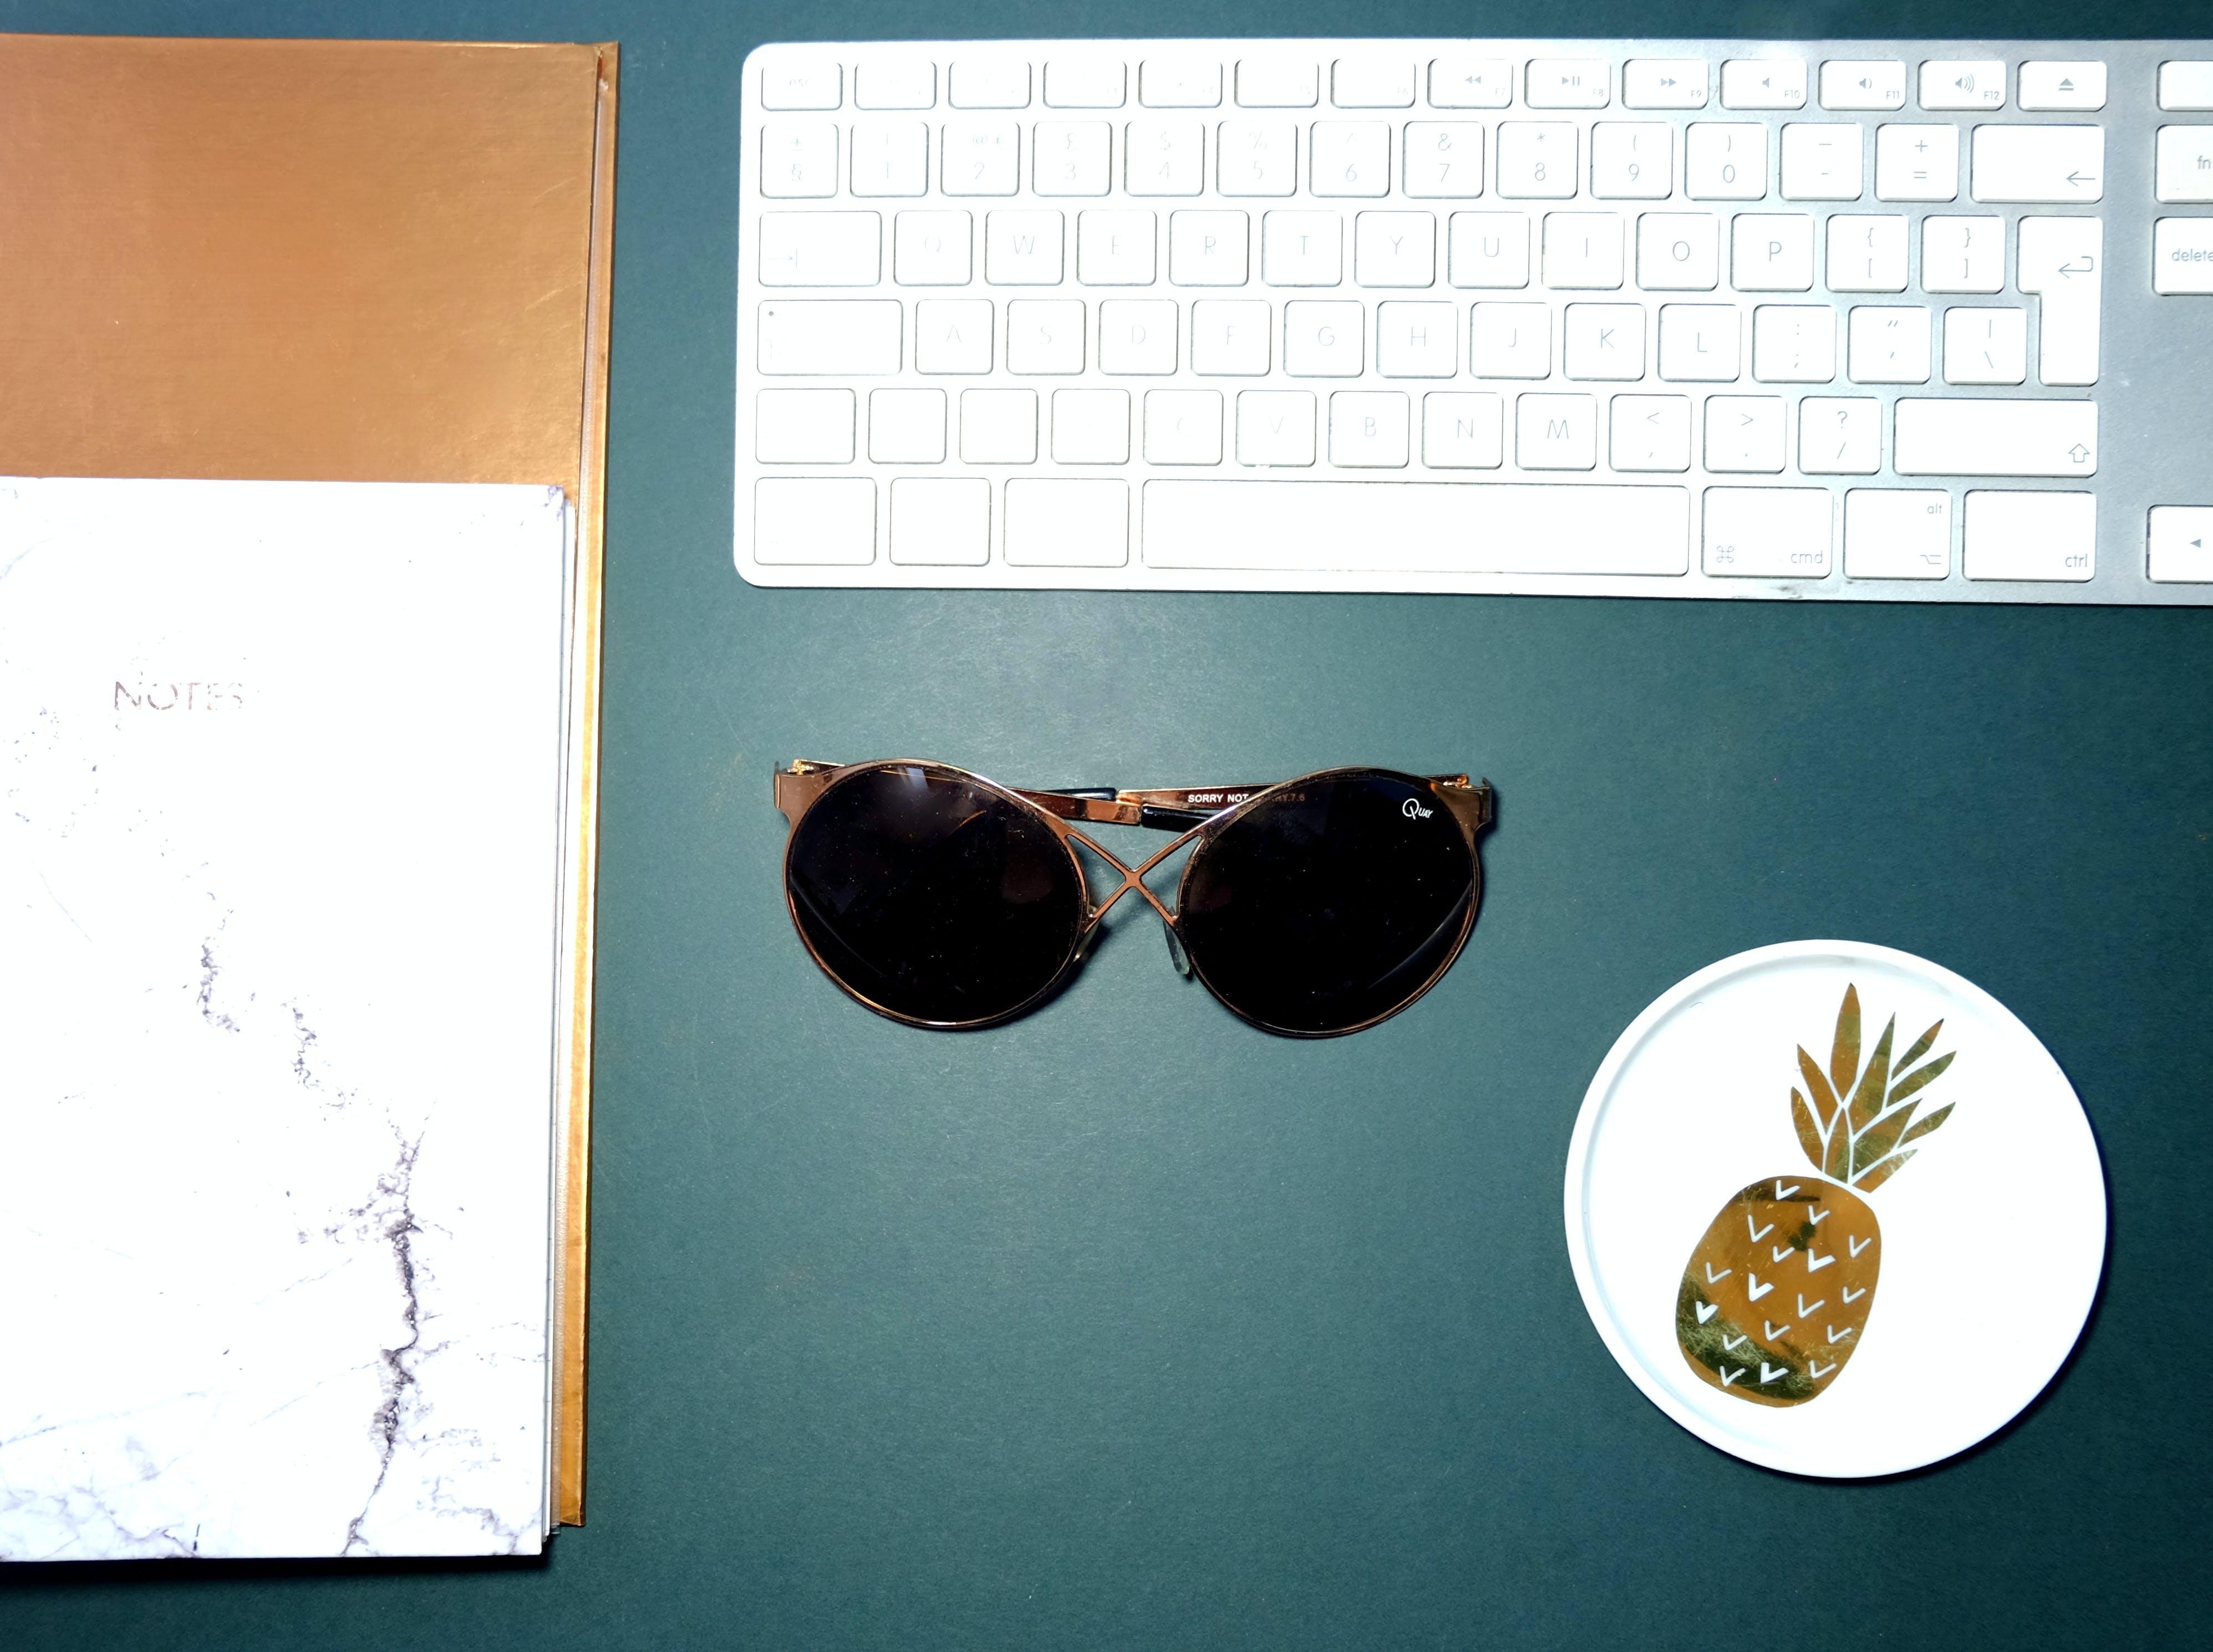 Free stock photo of apple keyboard, blue, classy, flatlay